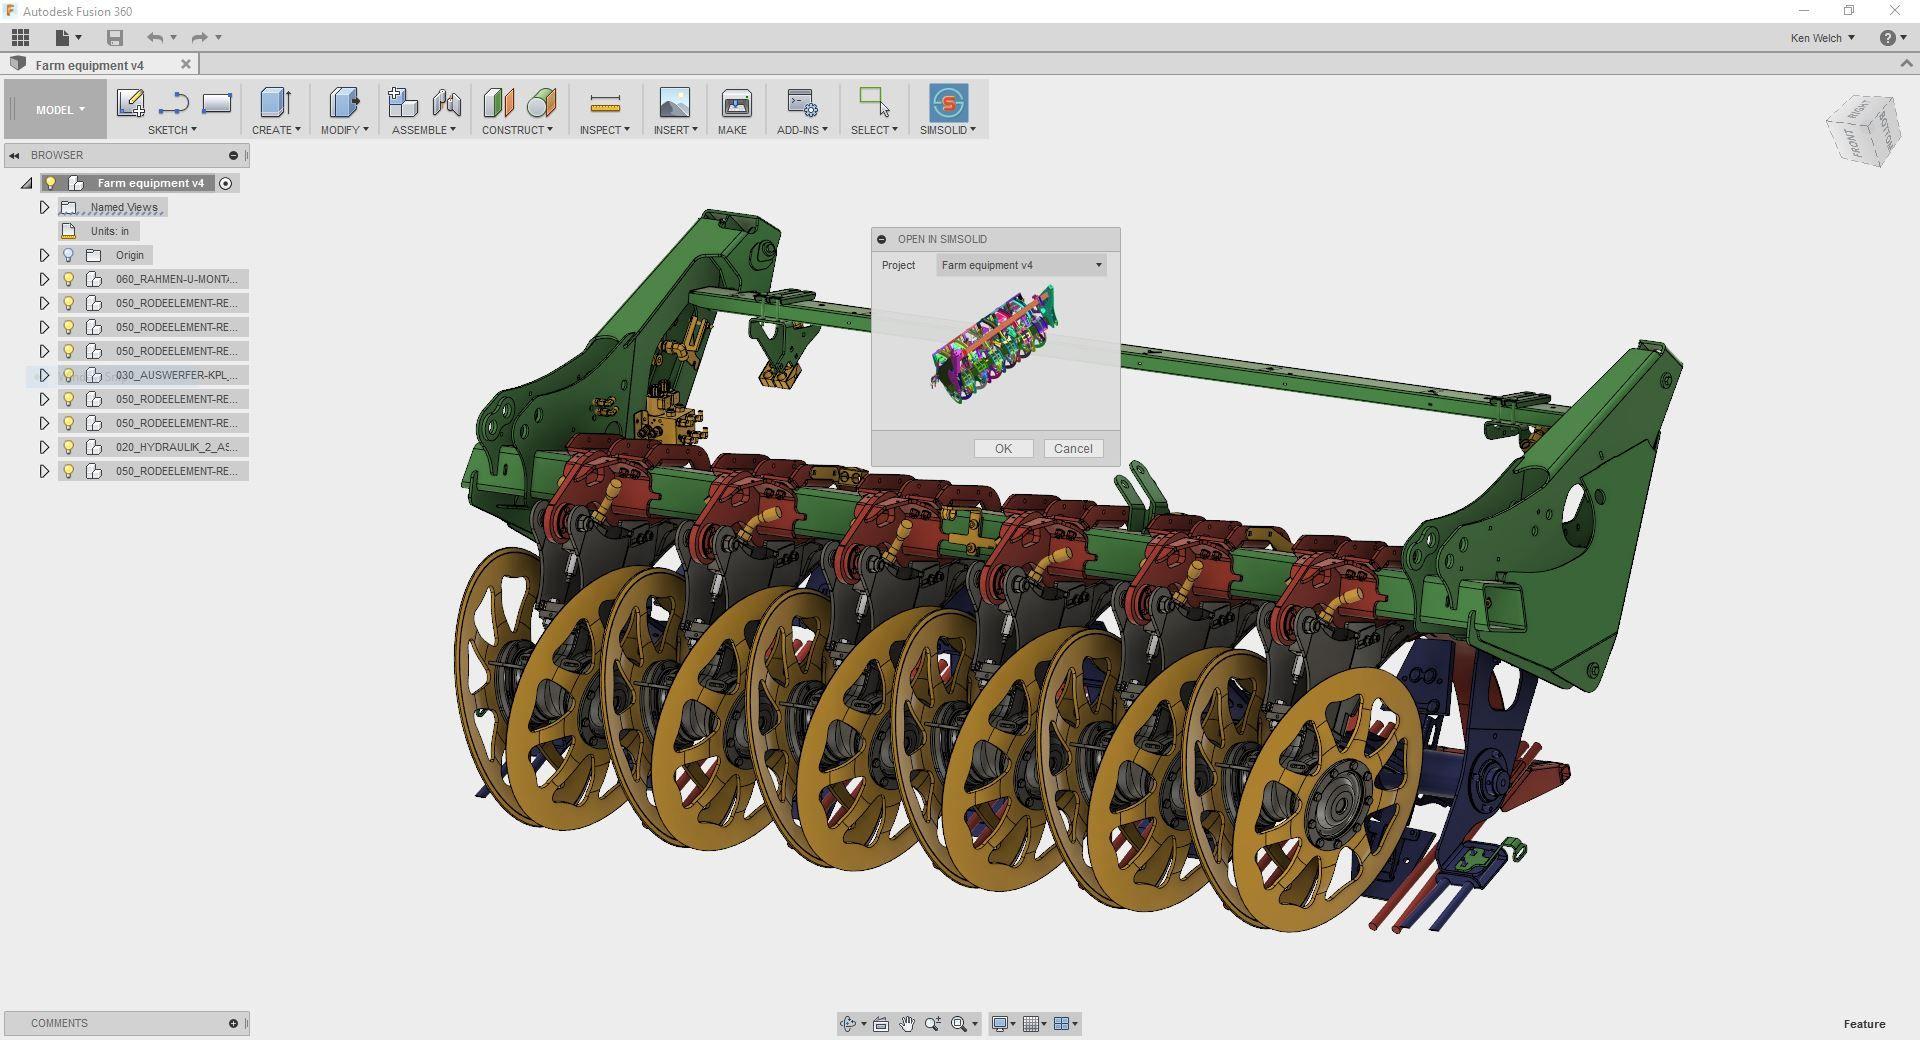 Farm-equipment-3-3500-3500